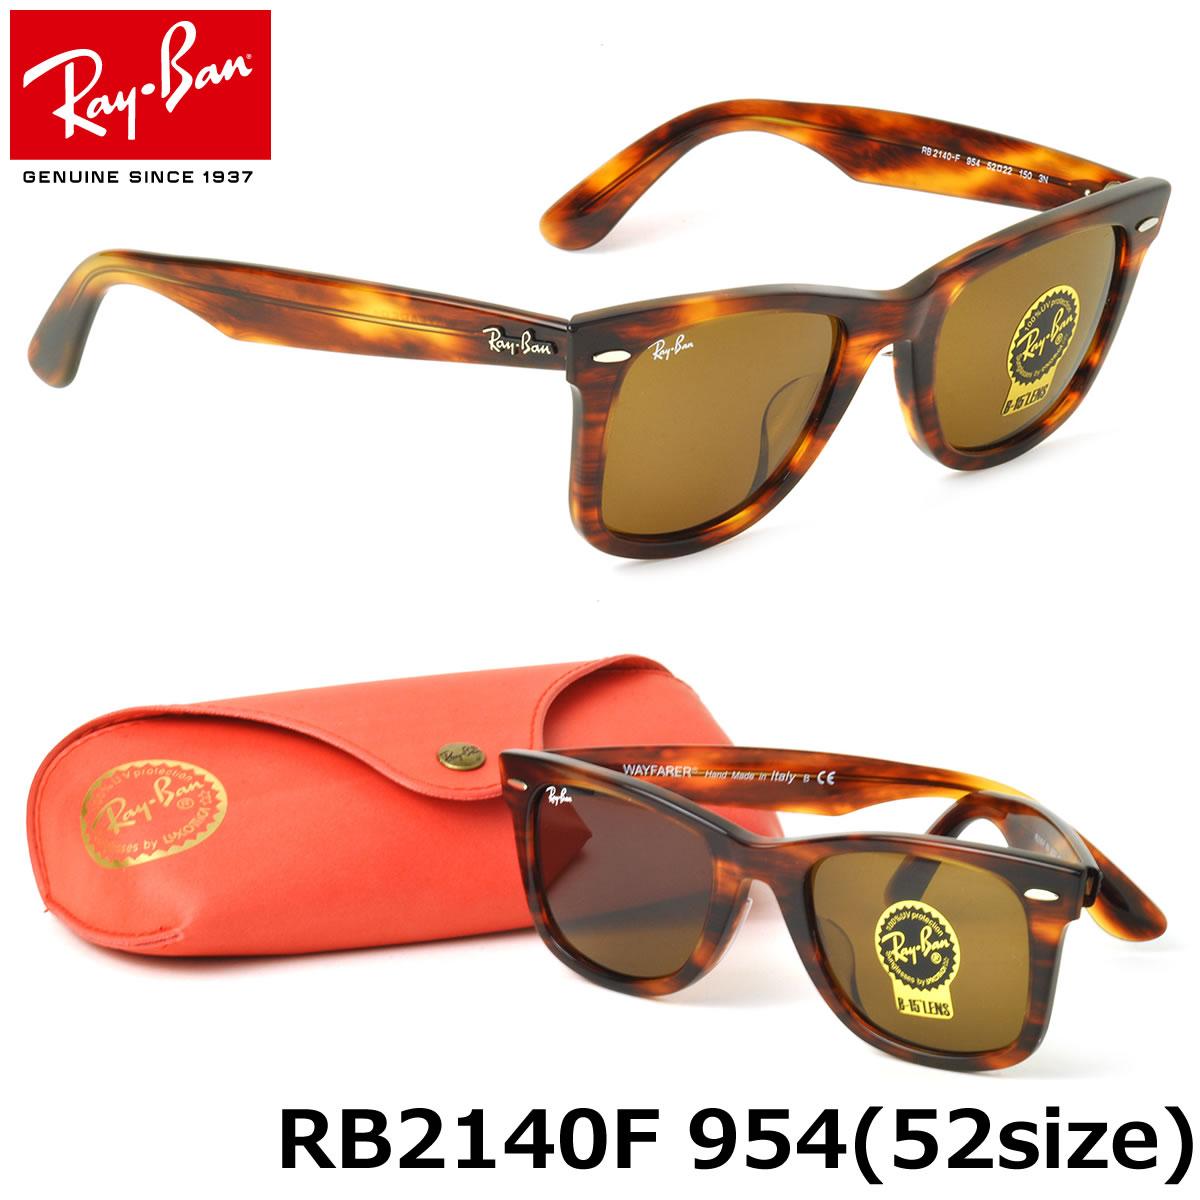 e26ae63646 Ray-Ban sunglasses way Farrar Ray-Ban RB2140F 954 52 size Ray-Ban ...